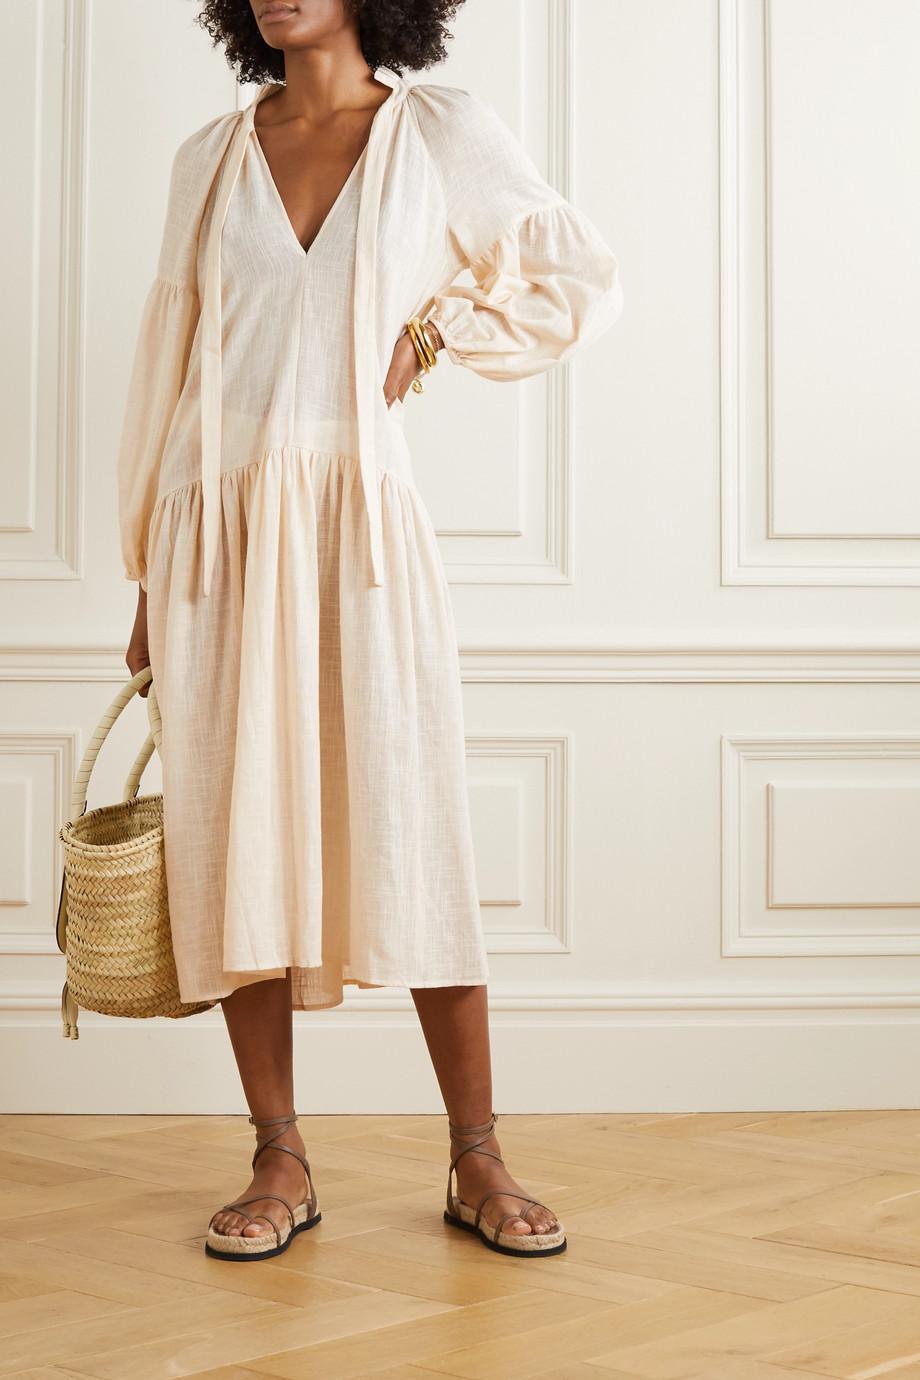 Cloe Cassandro + NET SUSTAIN Donna organic cotton-gauze dress